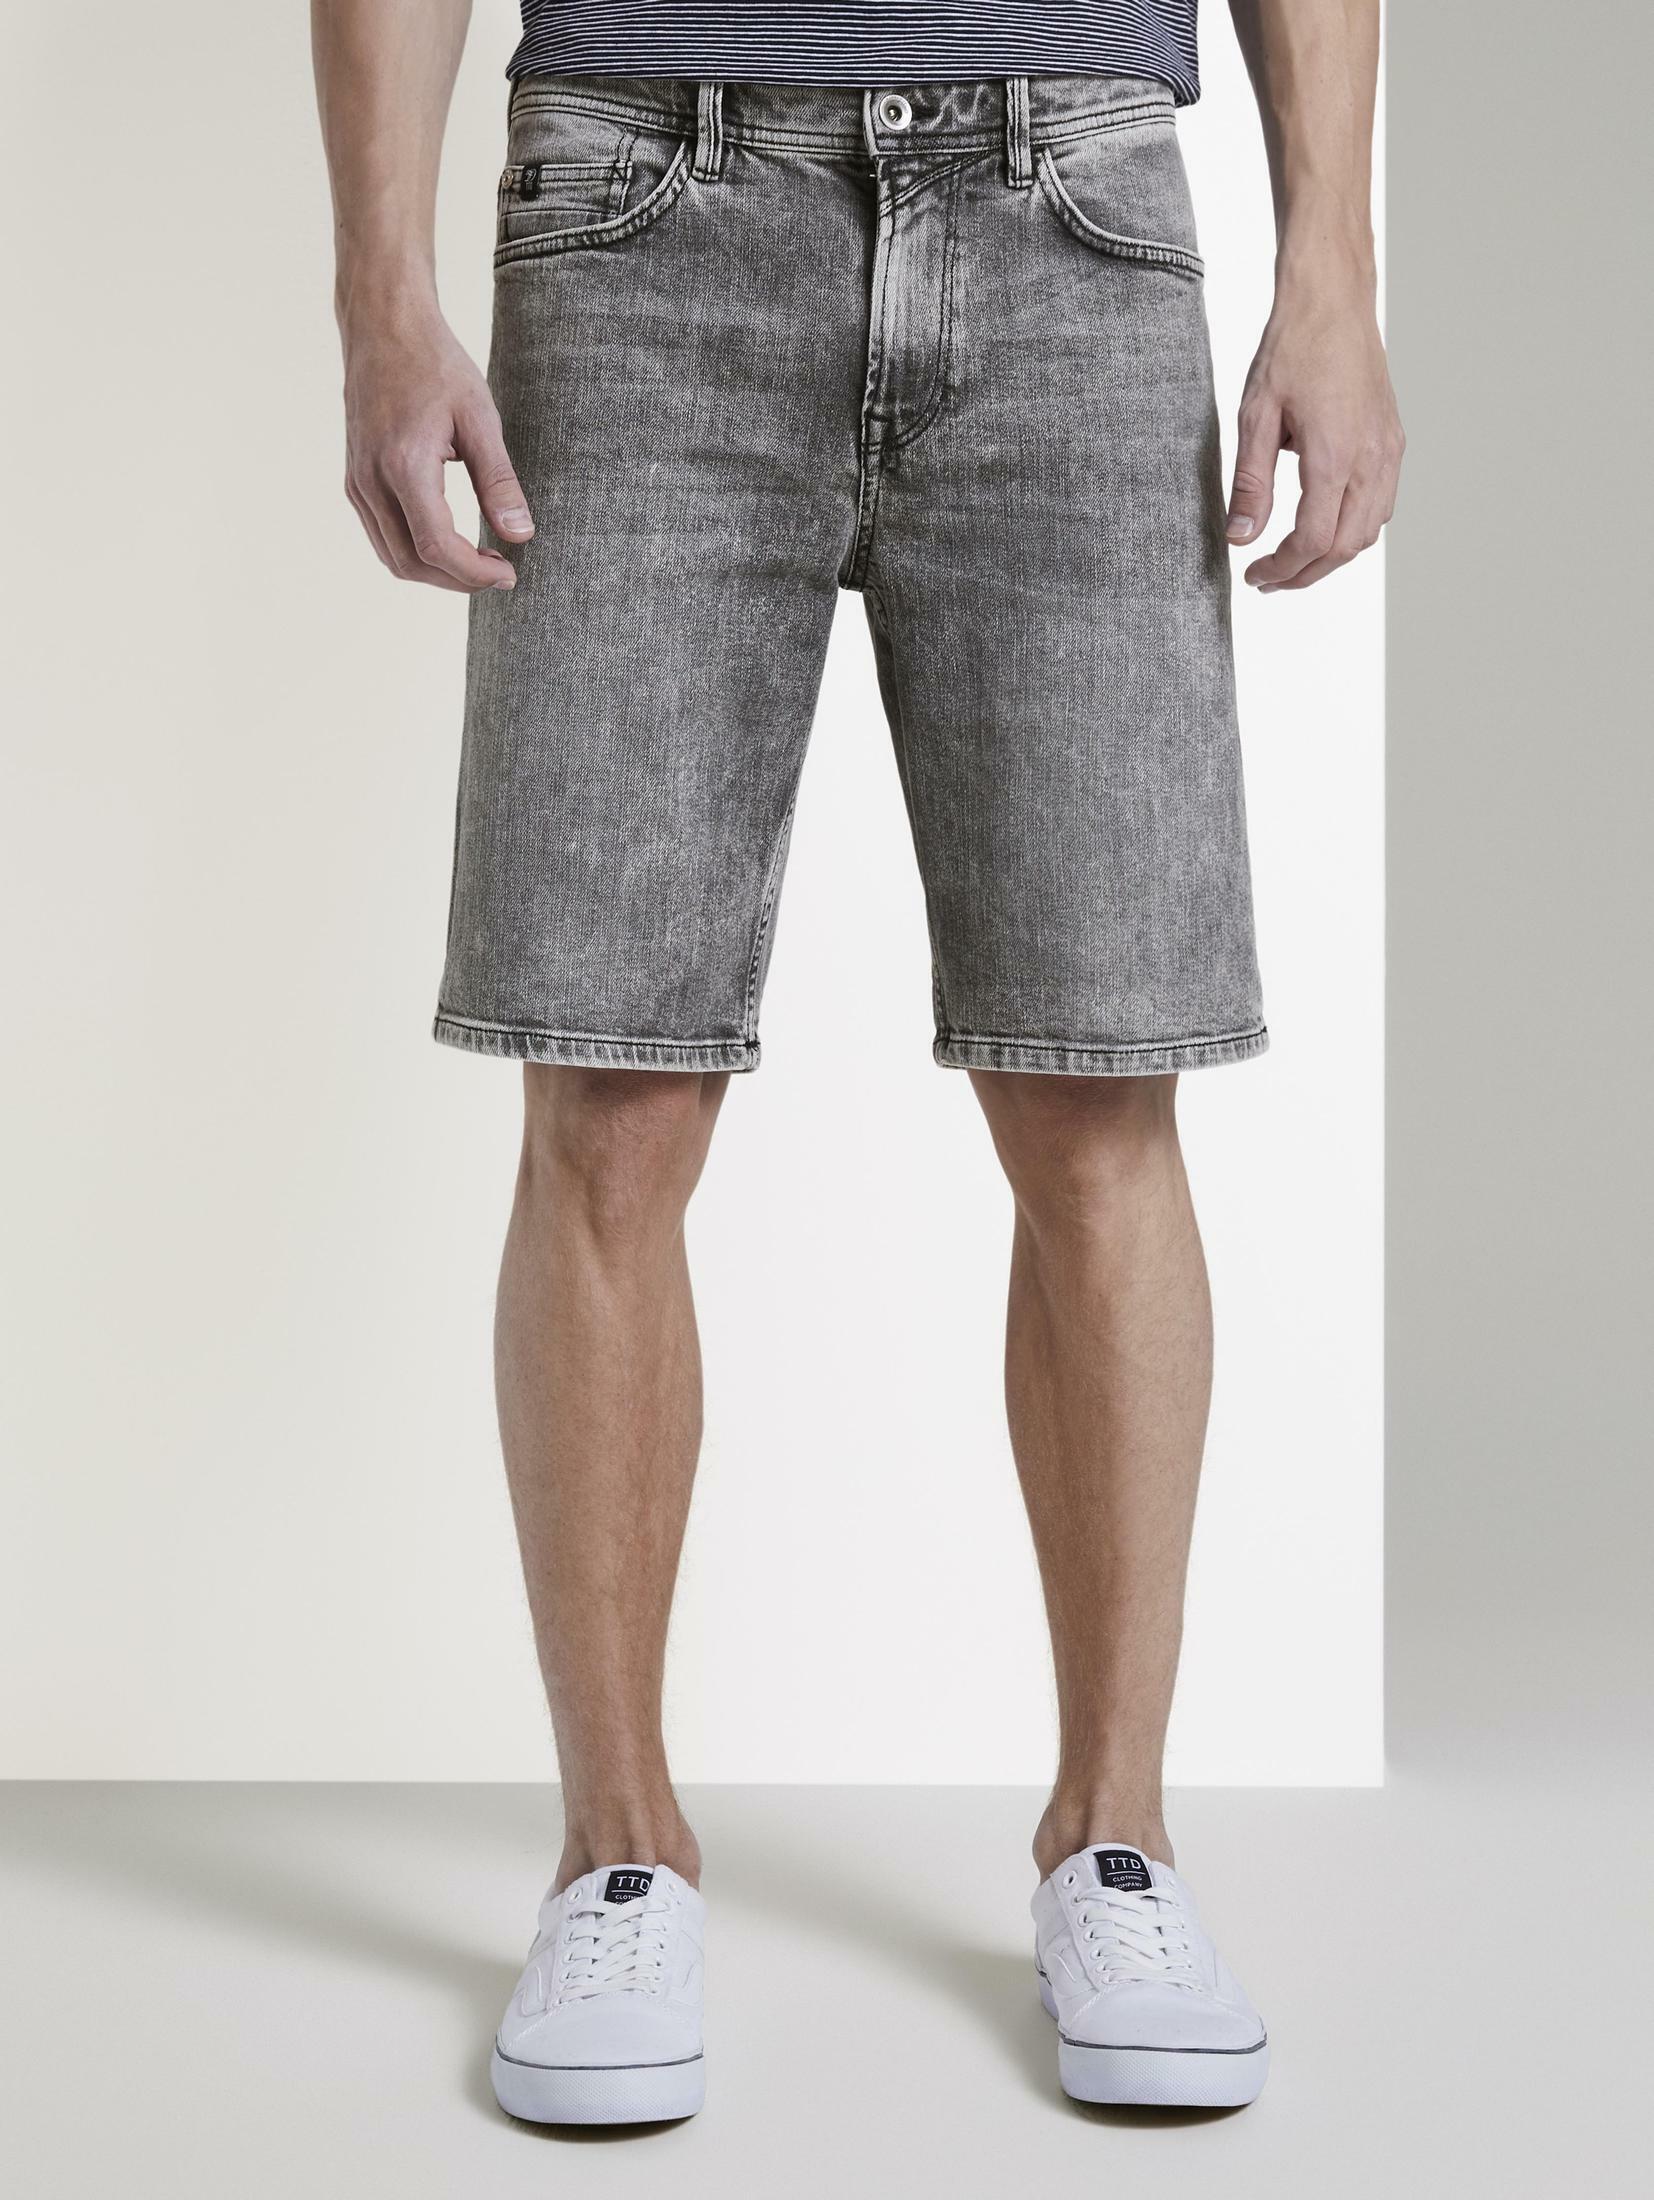 TOM TAILOR Denim Jeansbermudas Loose Fit Jeansshort in 90er Waschung | Bekleidung > Jeans > Loose Fit Jeans | Tom Tailor Denim